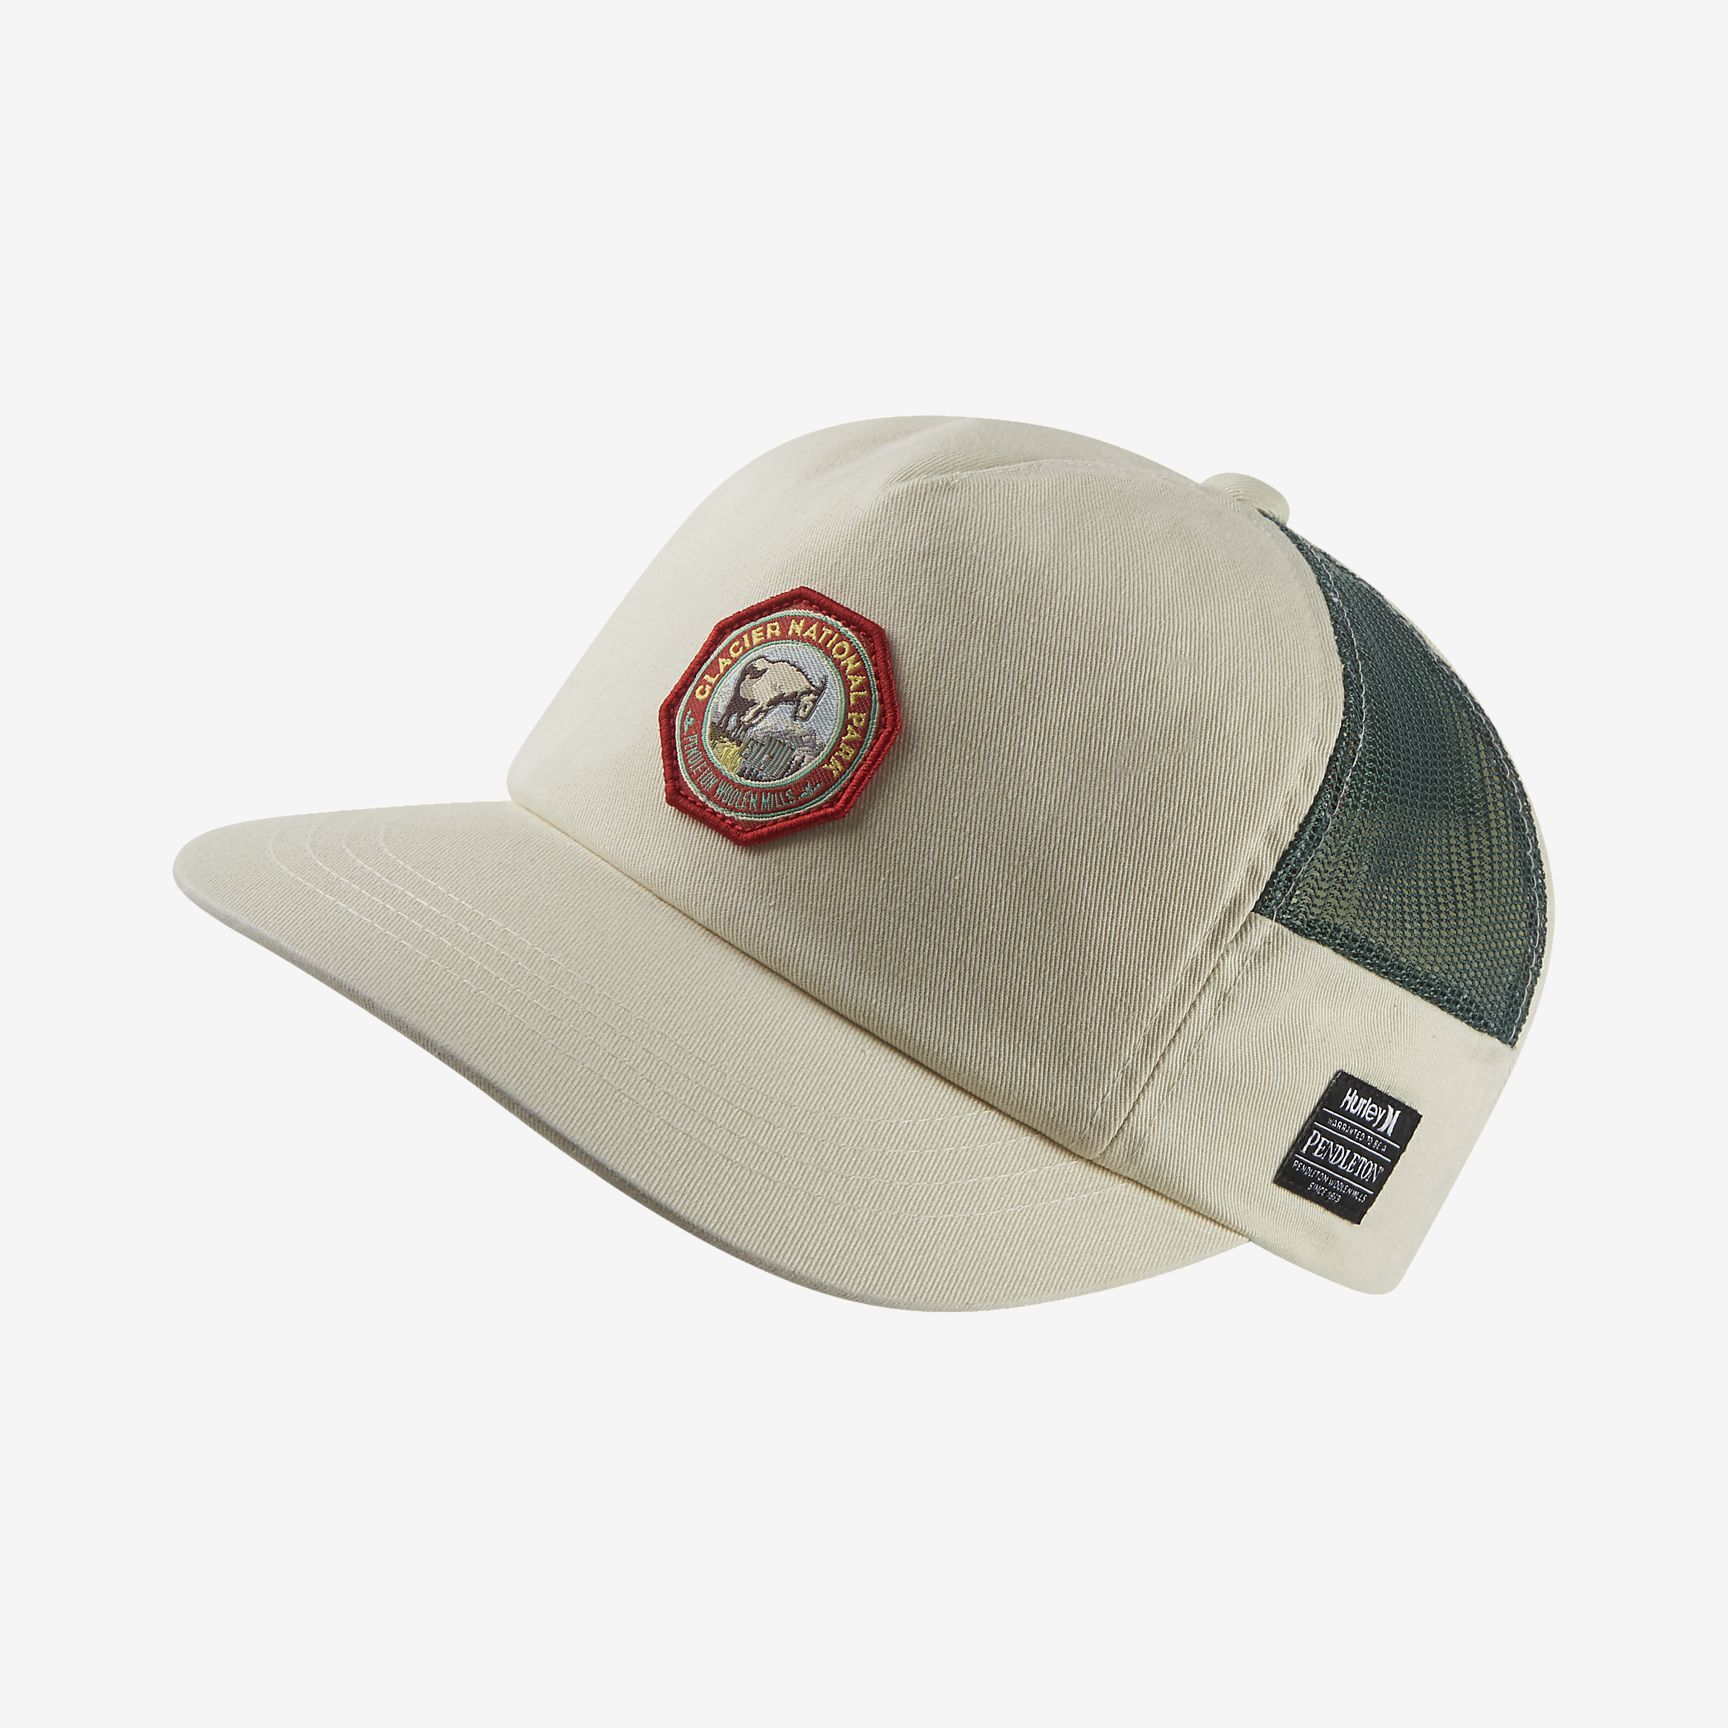 promo code be6b8 7b436 Hurley Pendleton Glacier Men s Adjustable Hat Hurley